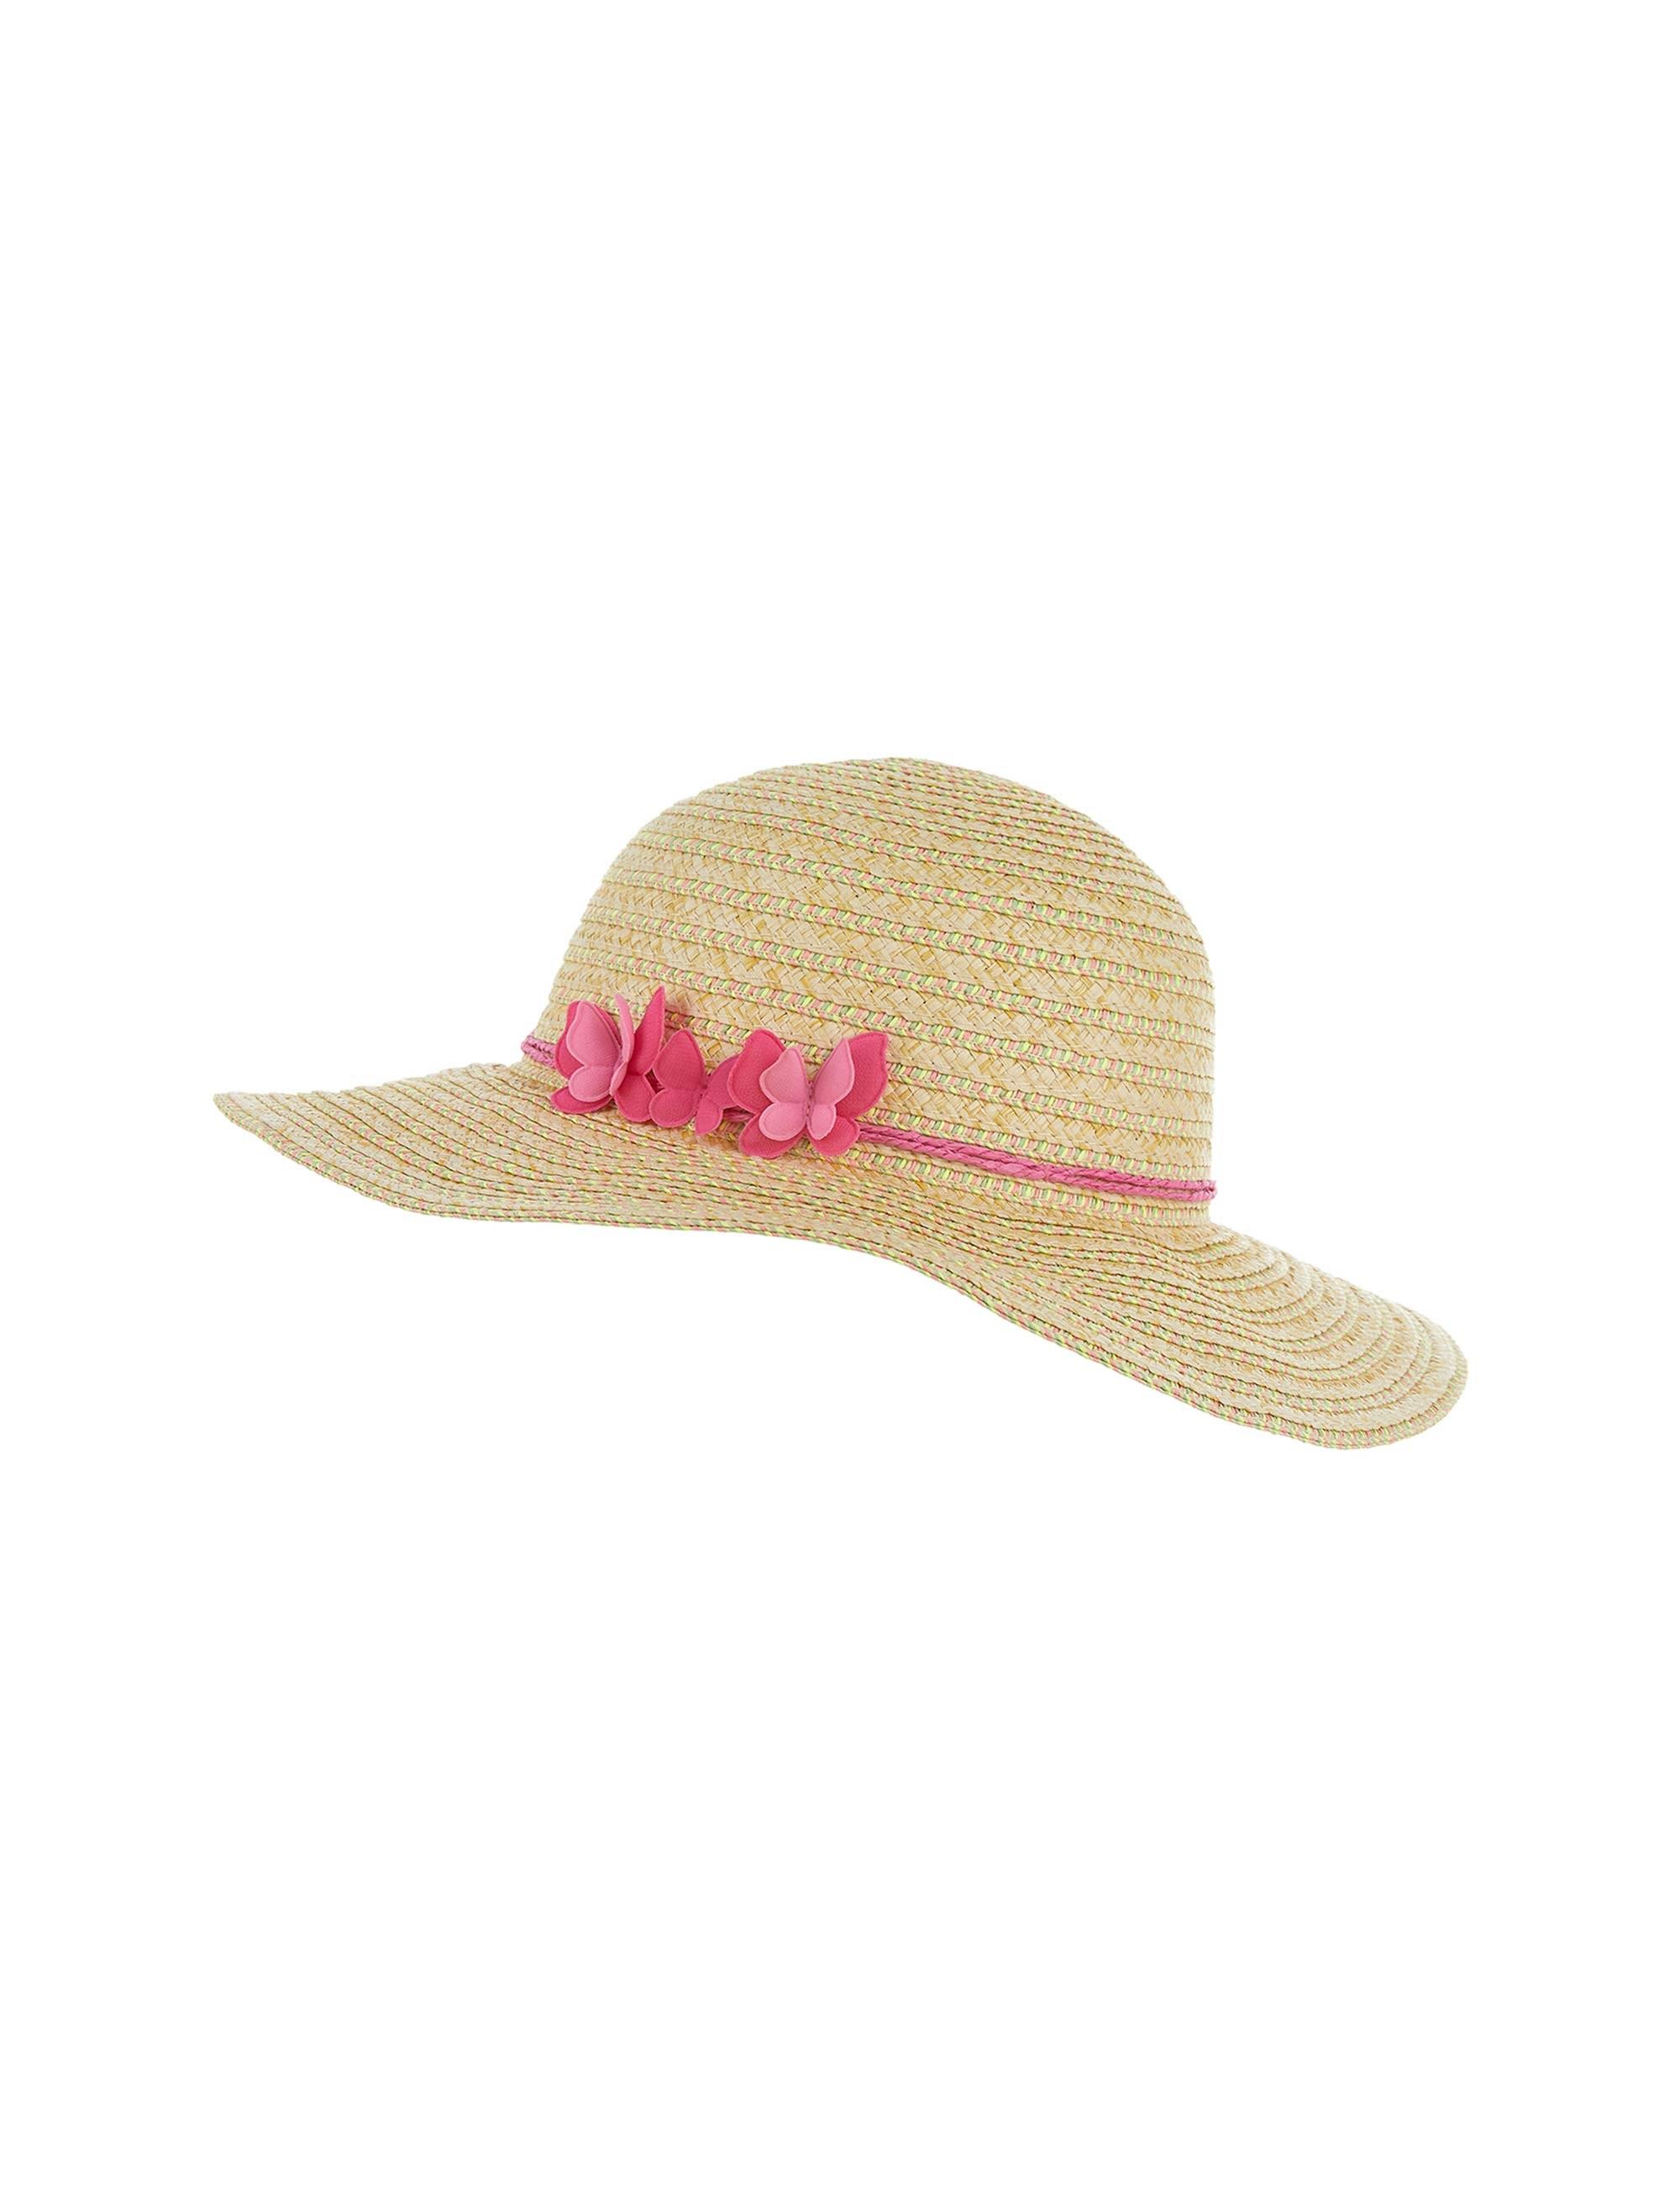 کلاه حصیری دخترانه PRETTY BUTTERFLY FLOPPY